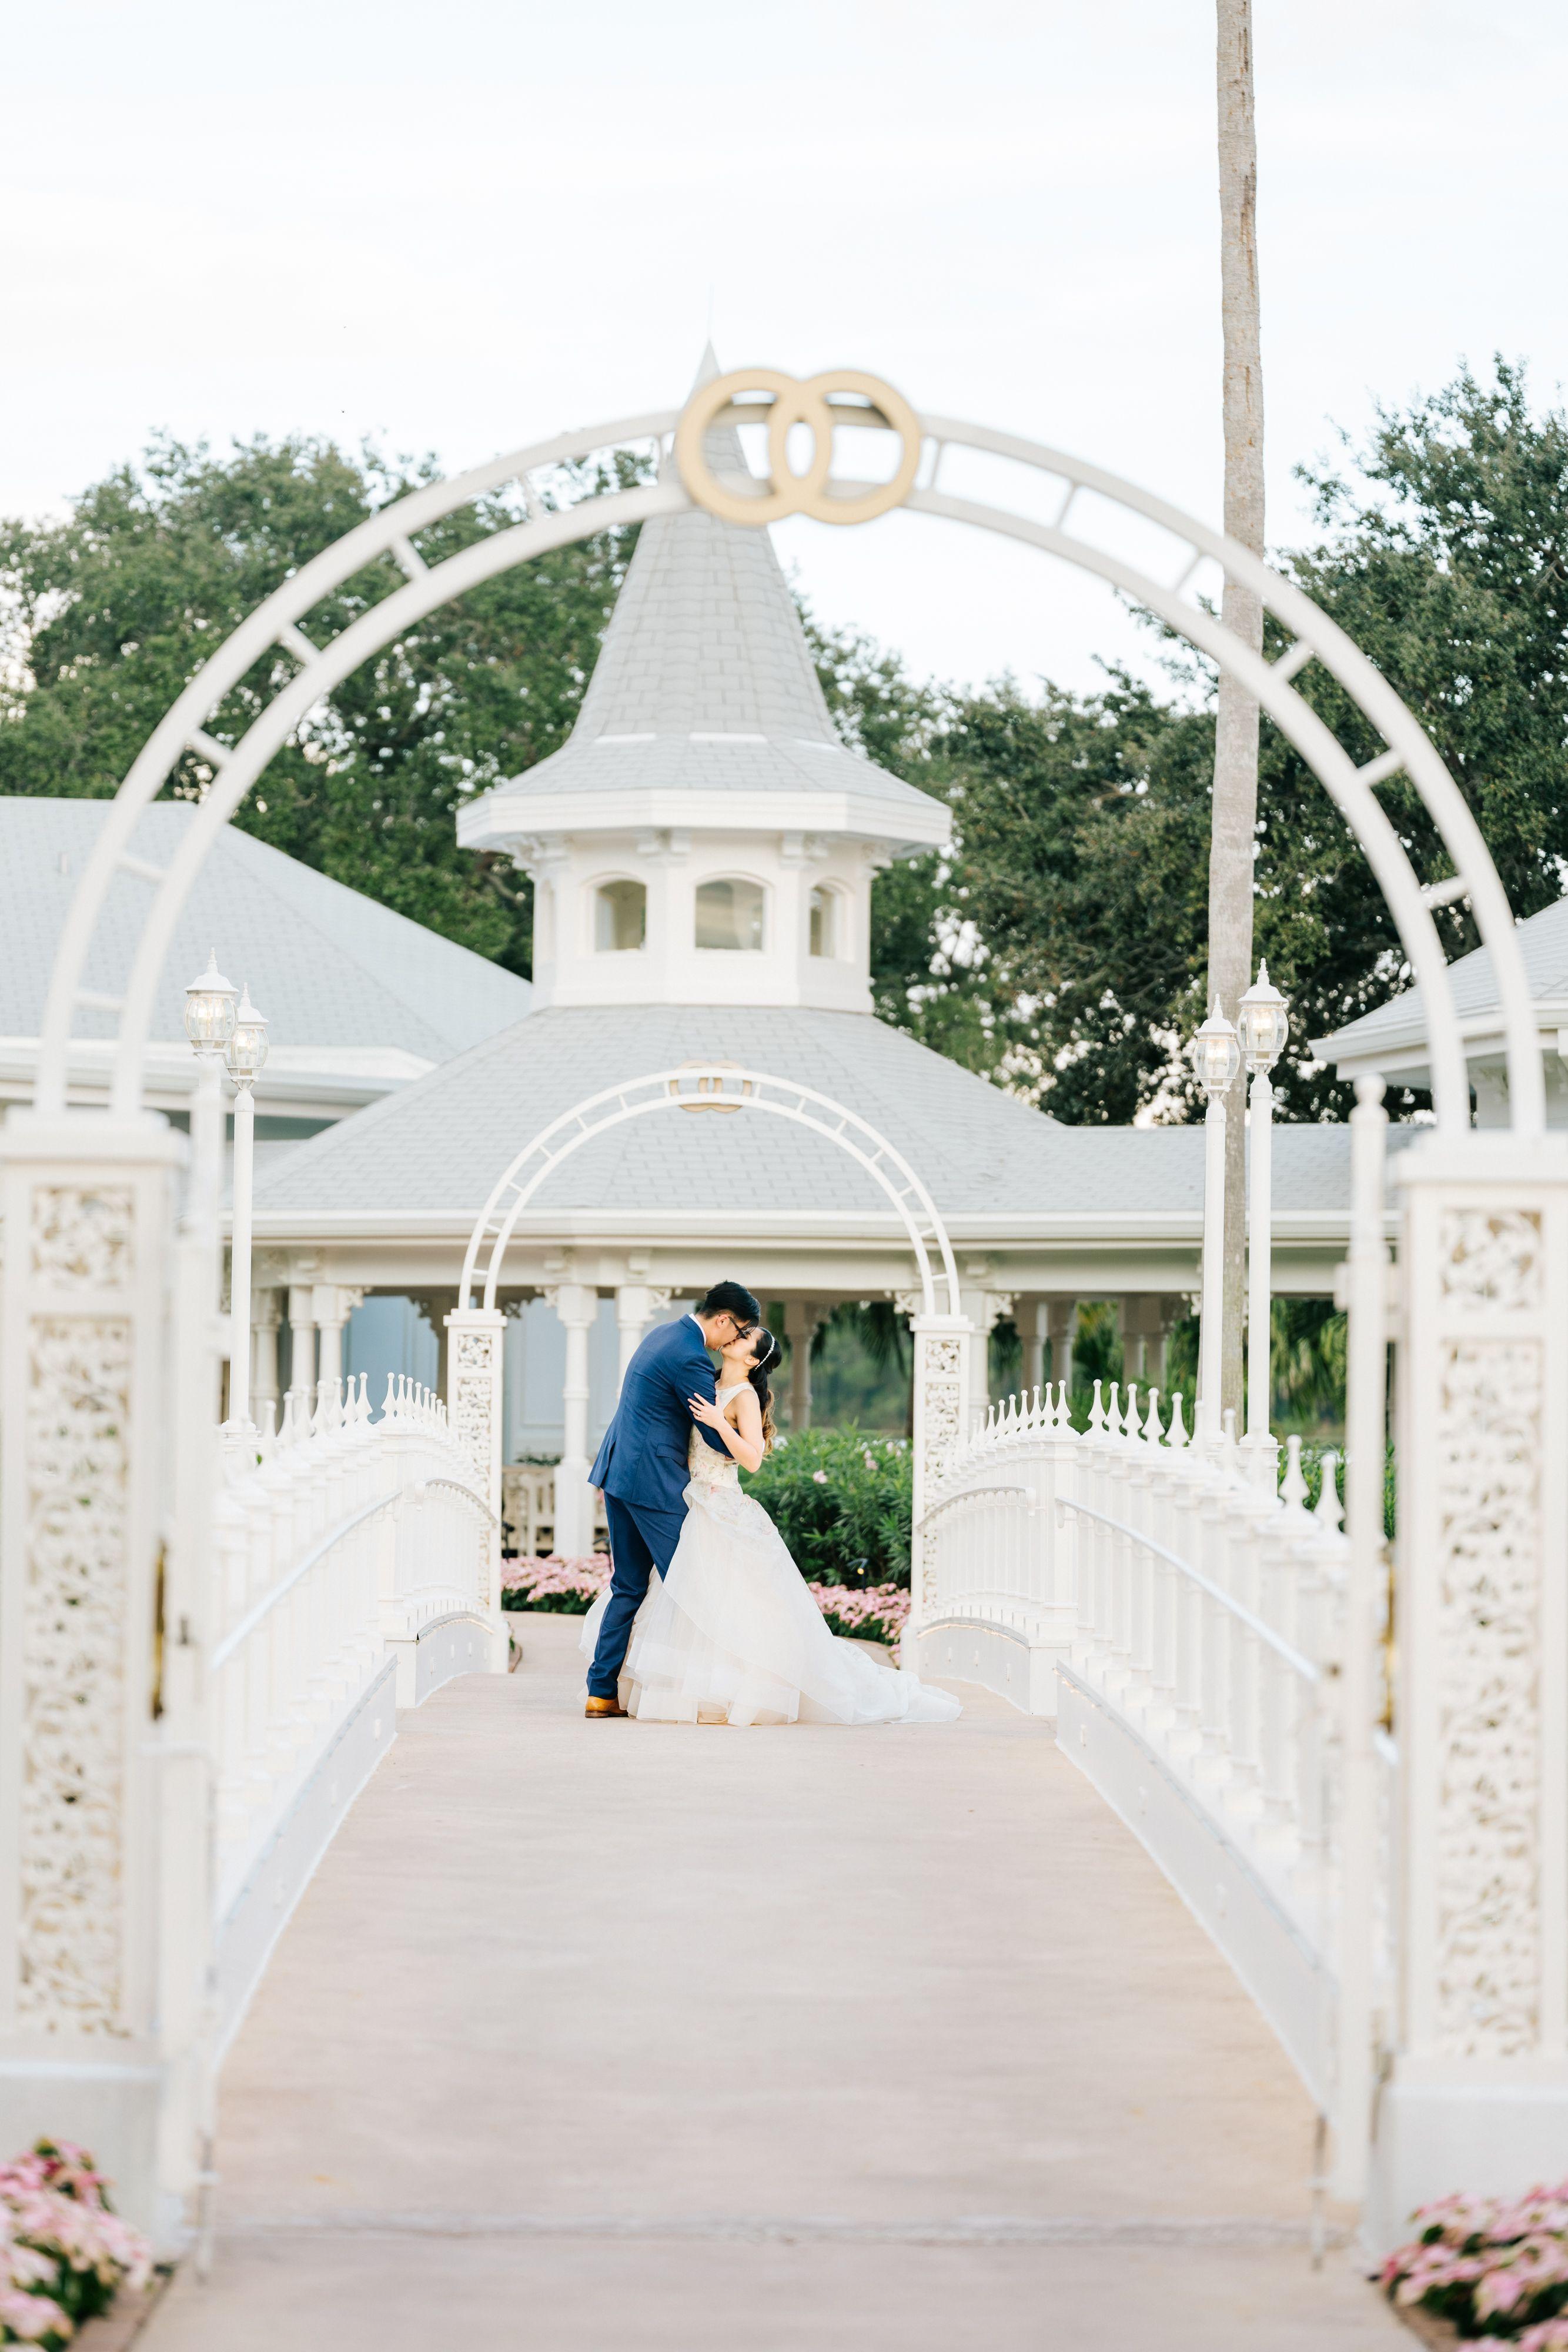 Disneys wedding pavilion wedding photography grand